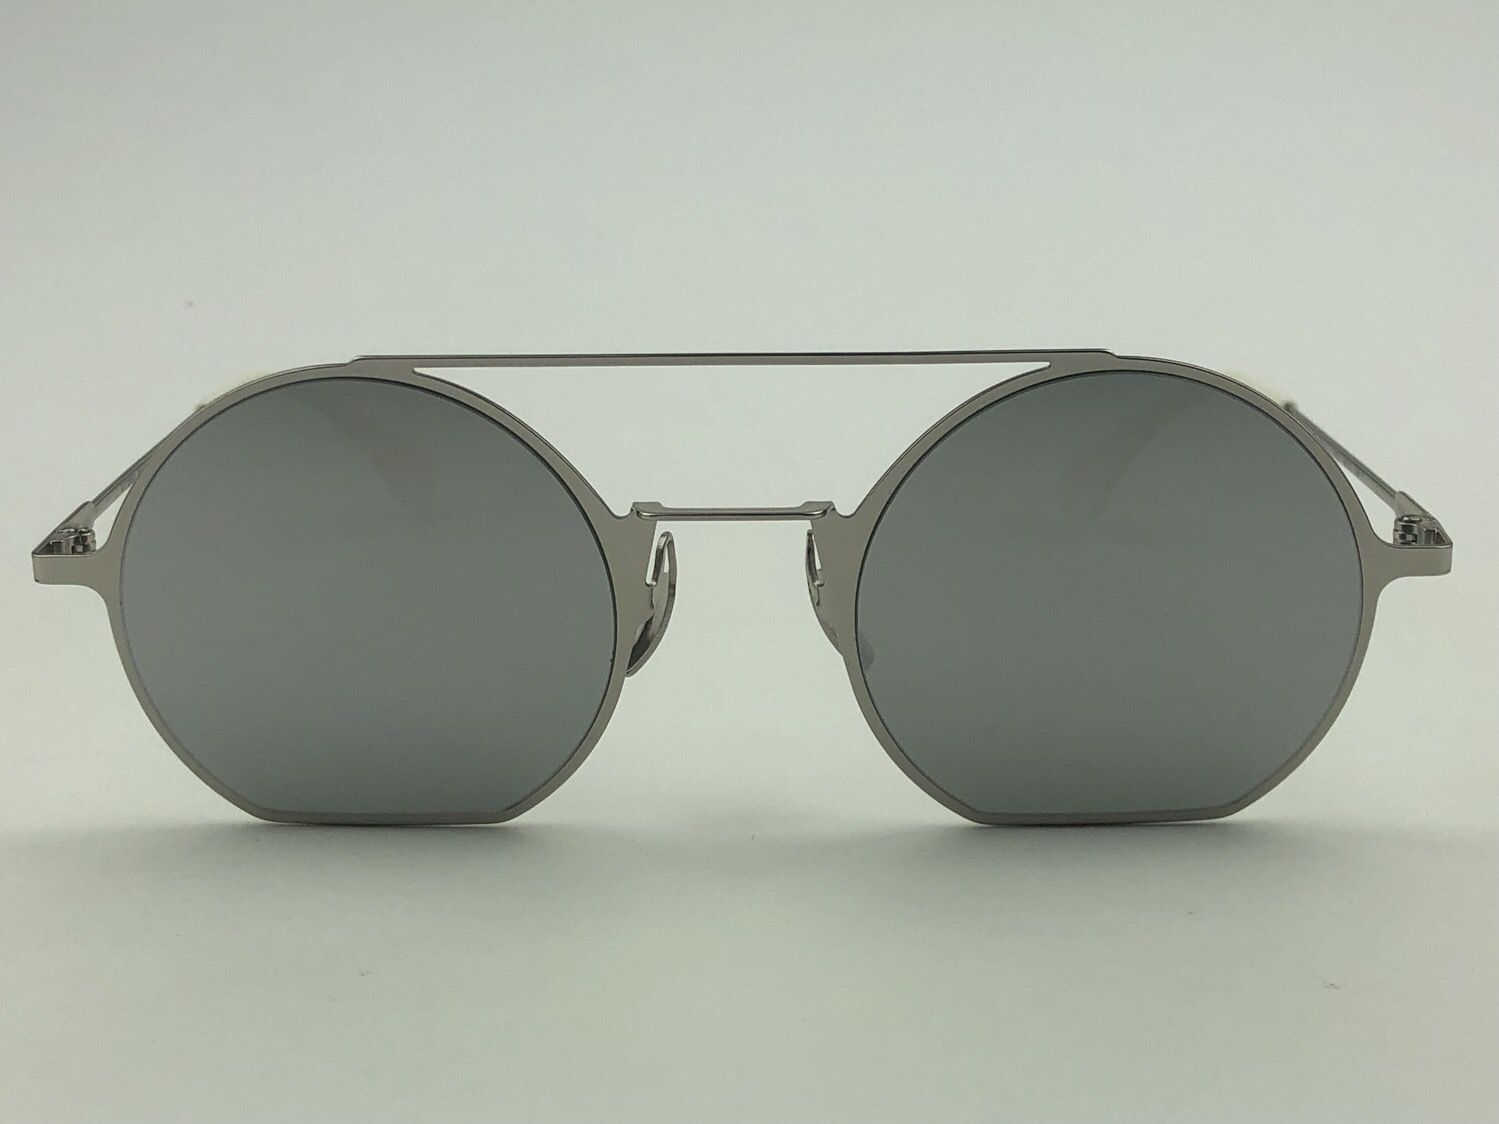 f44dd3716 Óculos de sol Fendi FD0291 010 48 - Otica La Croisette